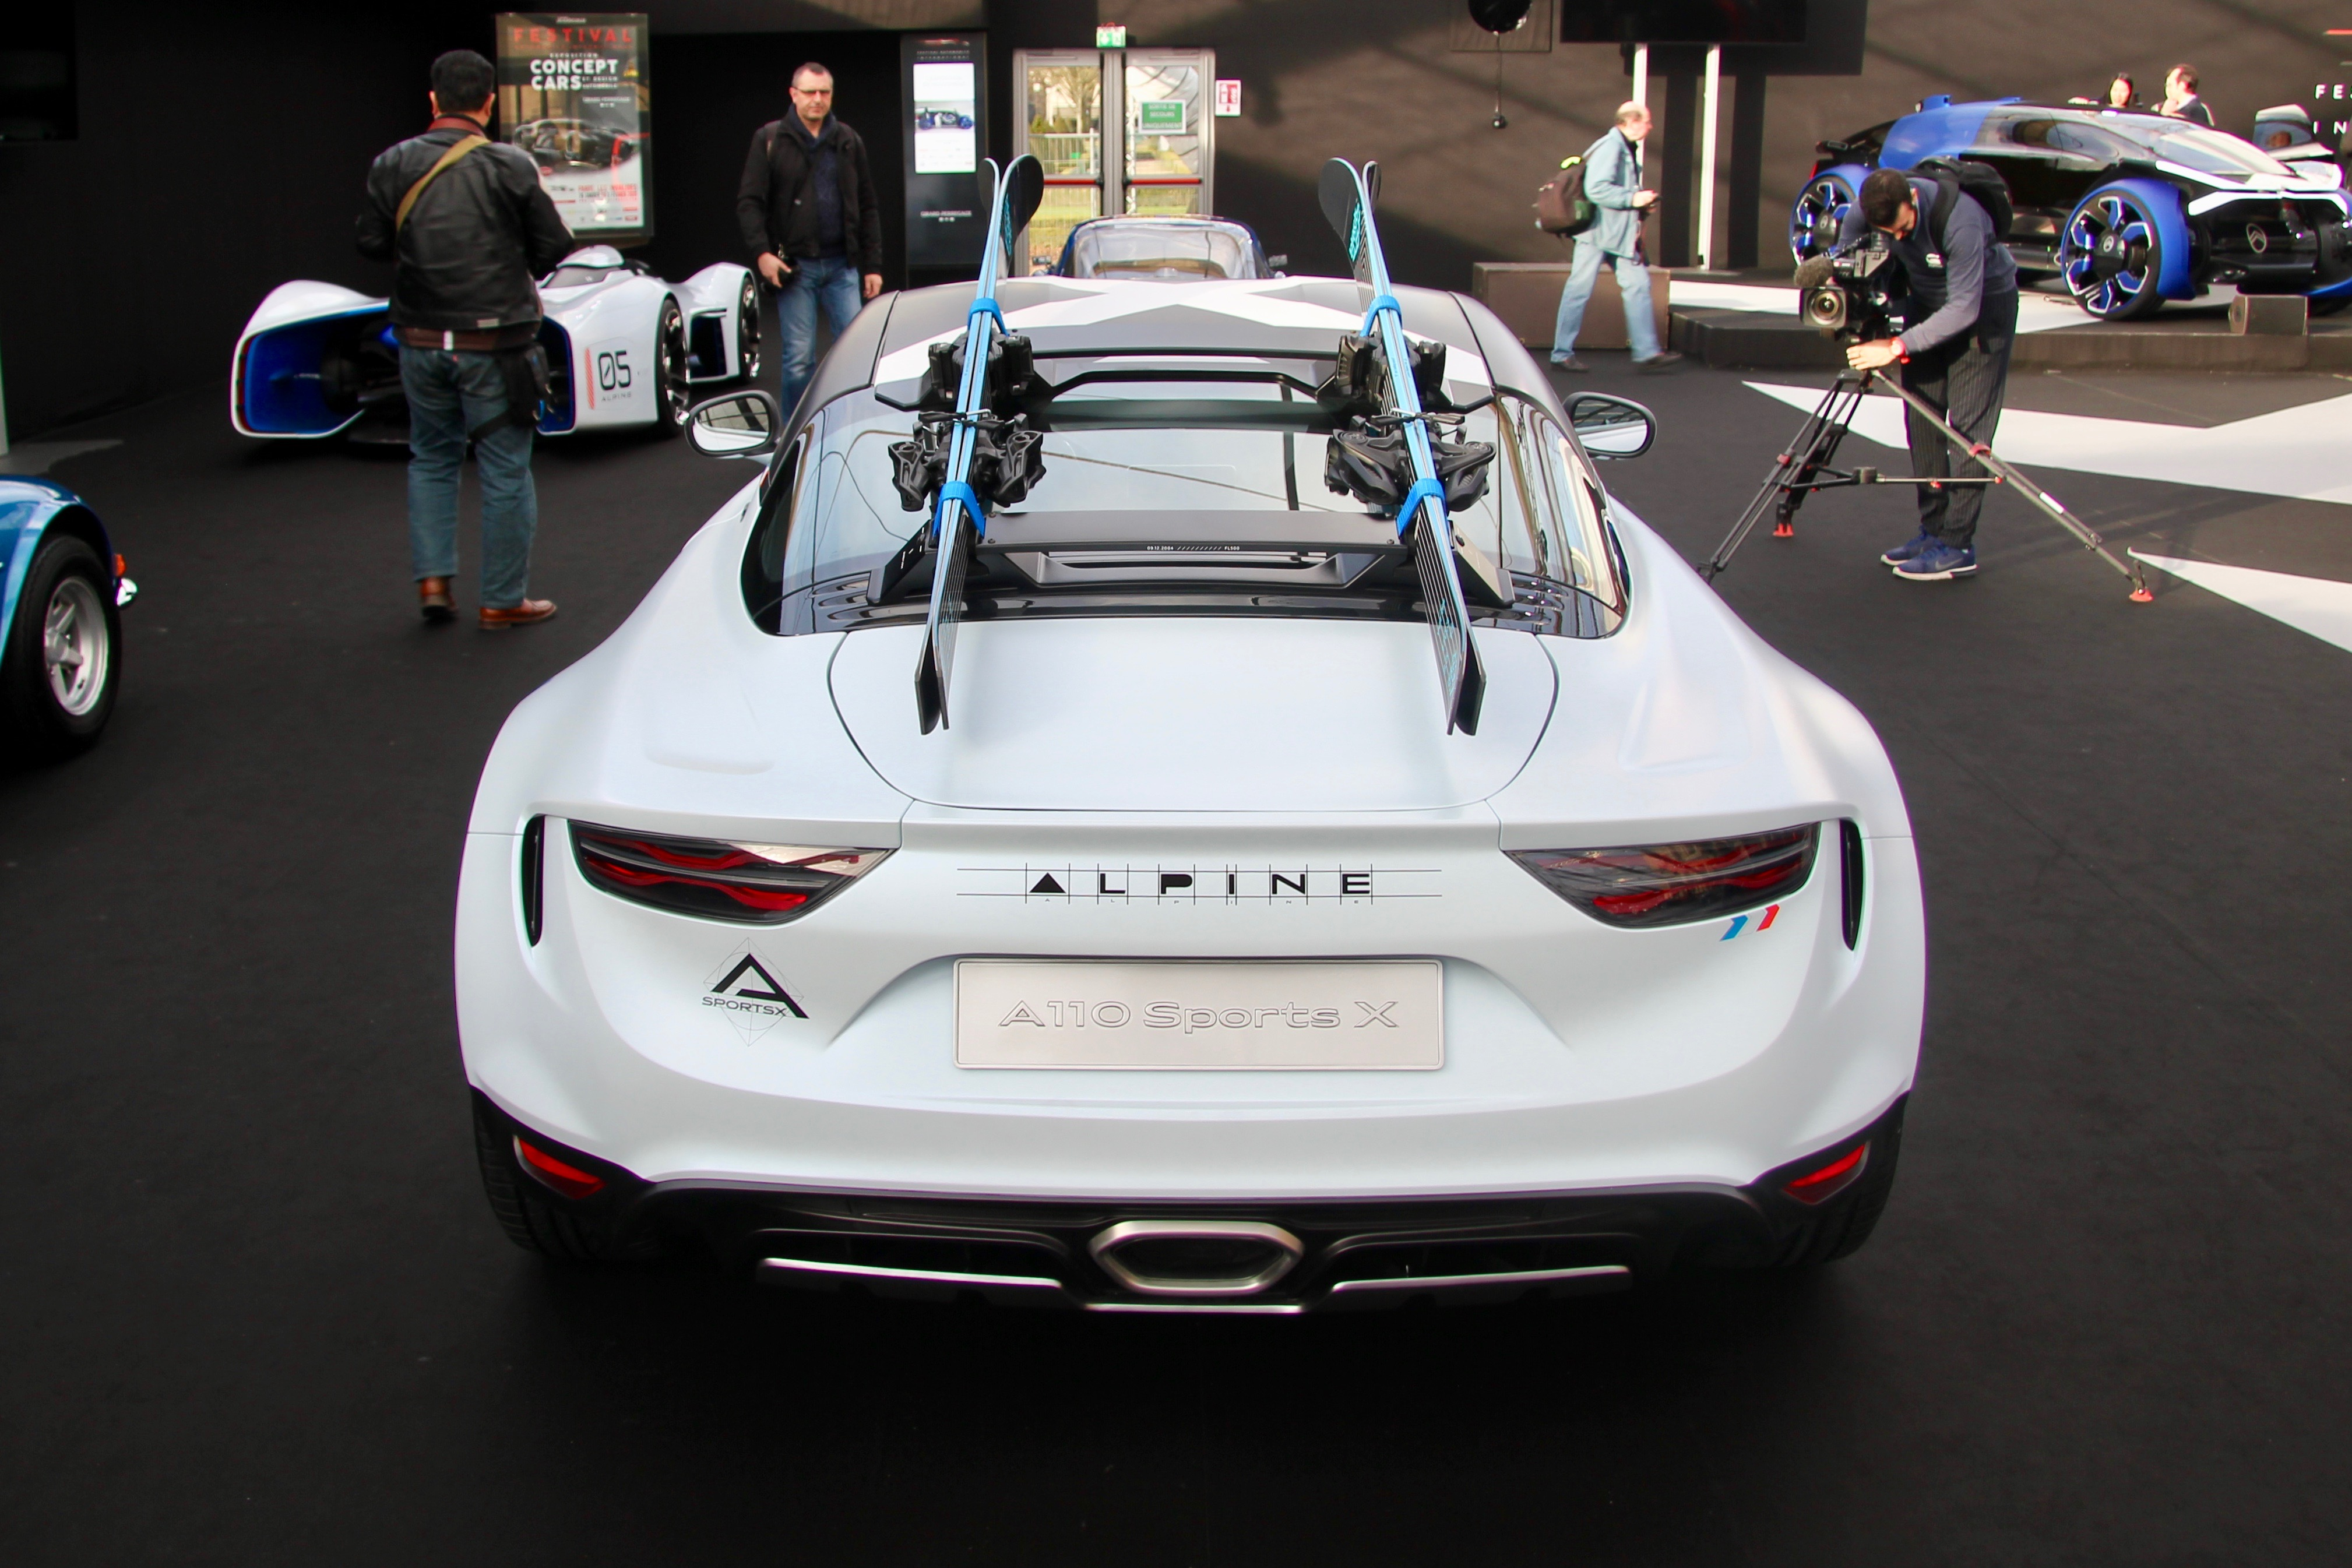 Alpine A110 SportsX - rear / arrière - Festival Automobile International - 2020 - exposition Concept Cars - Design Automobile - photo Ludo Ferrari